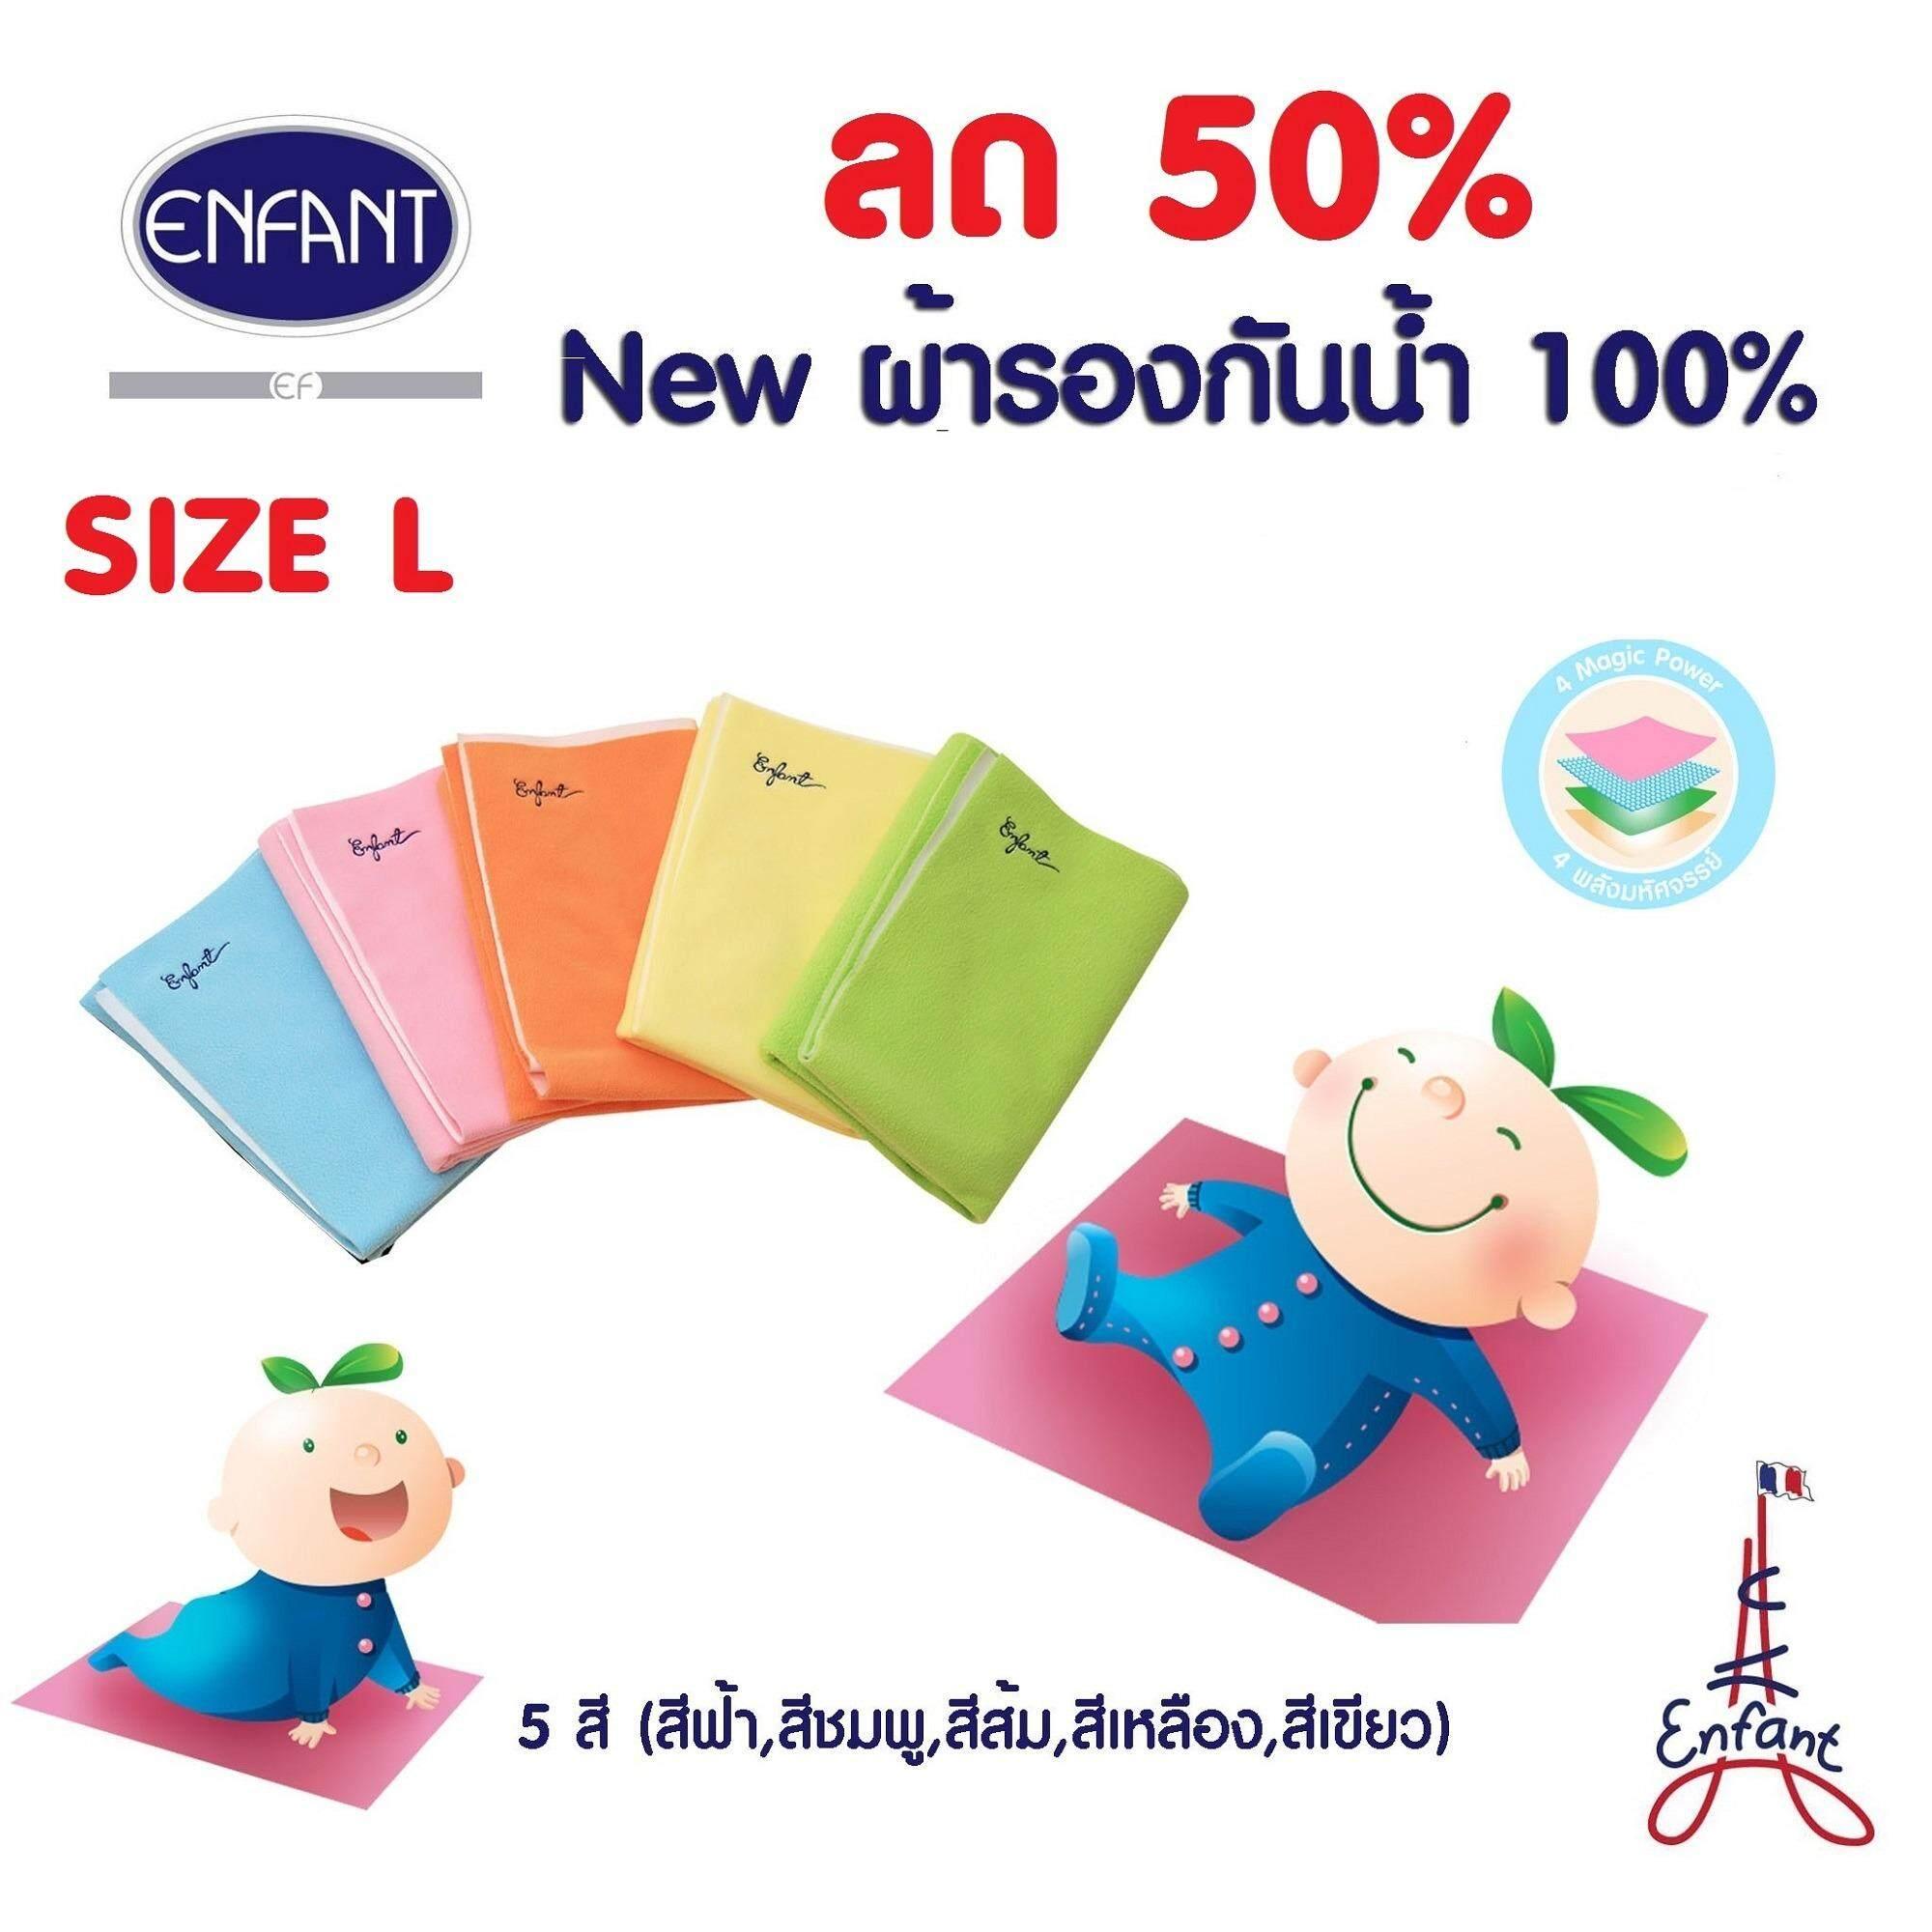 Enfant ผ้ารองกันน้ำ 100% SIZE L ขนาด 100 X 140 ซม.